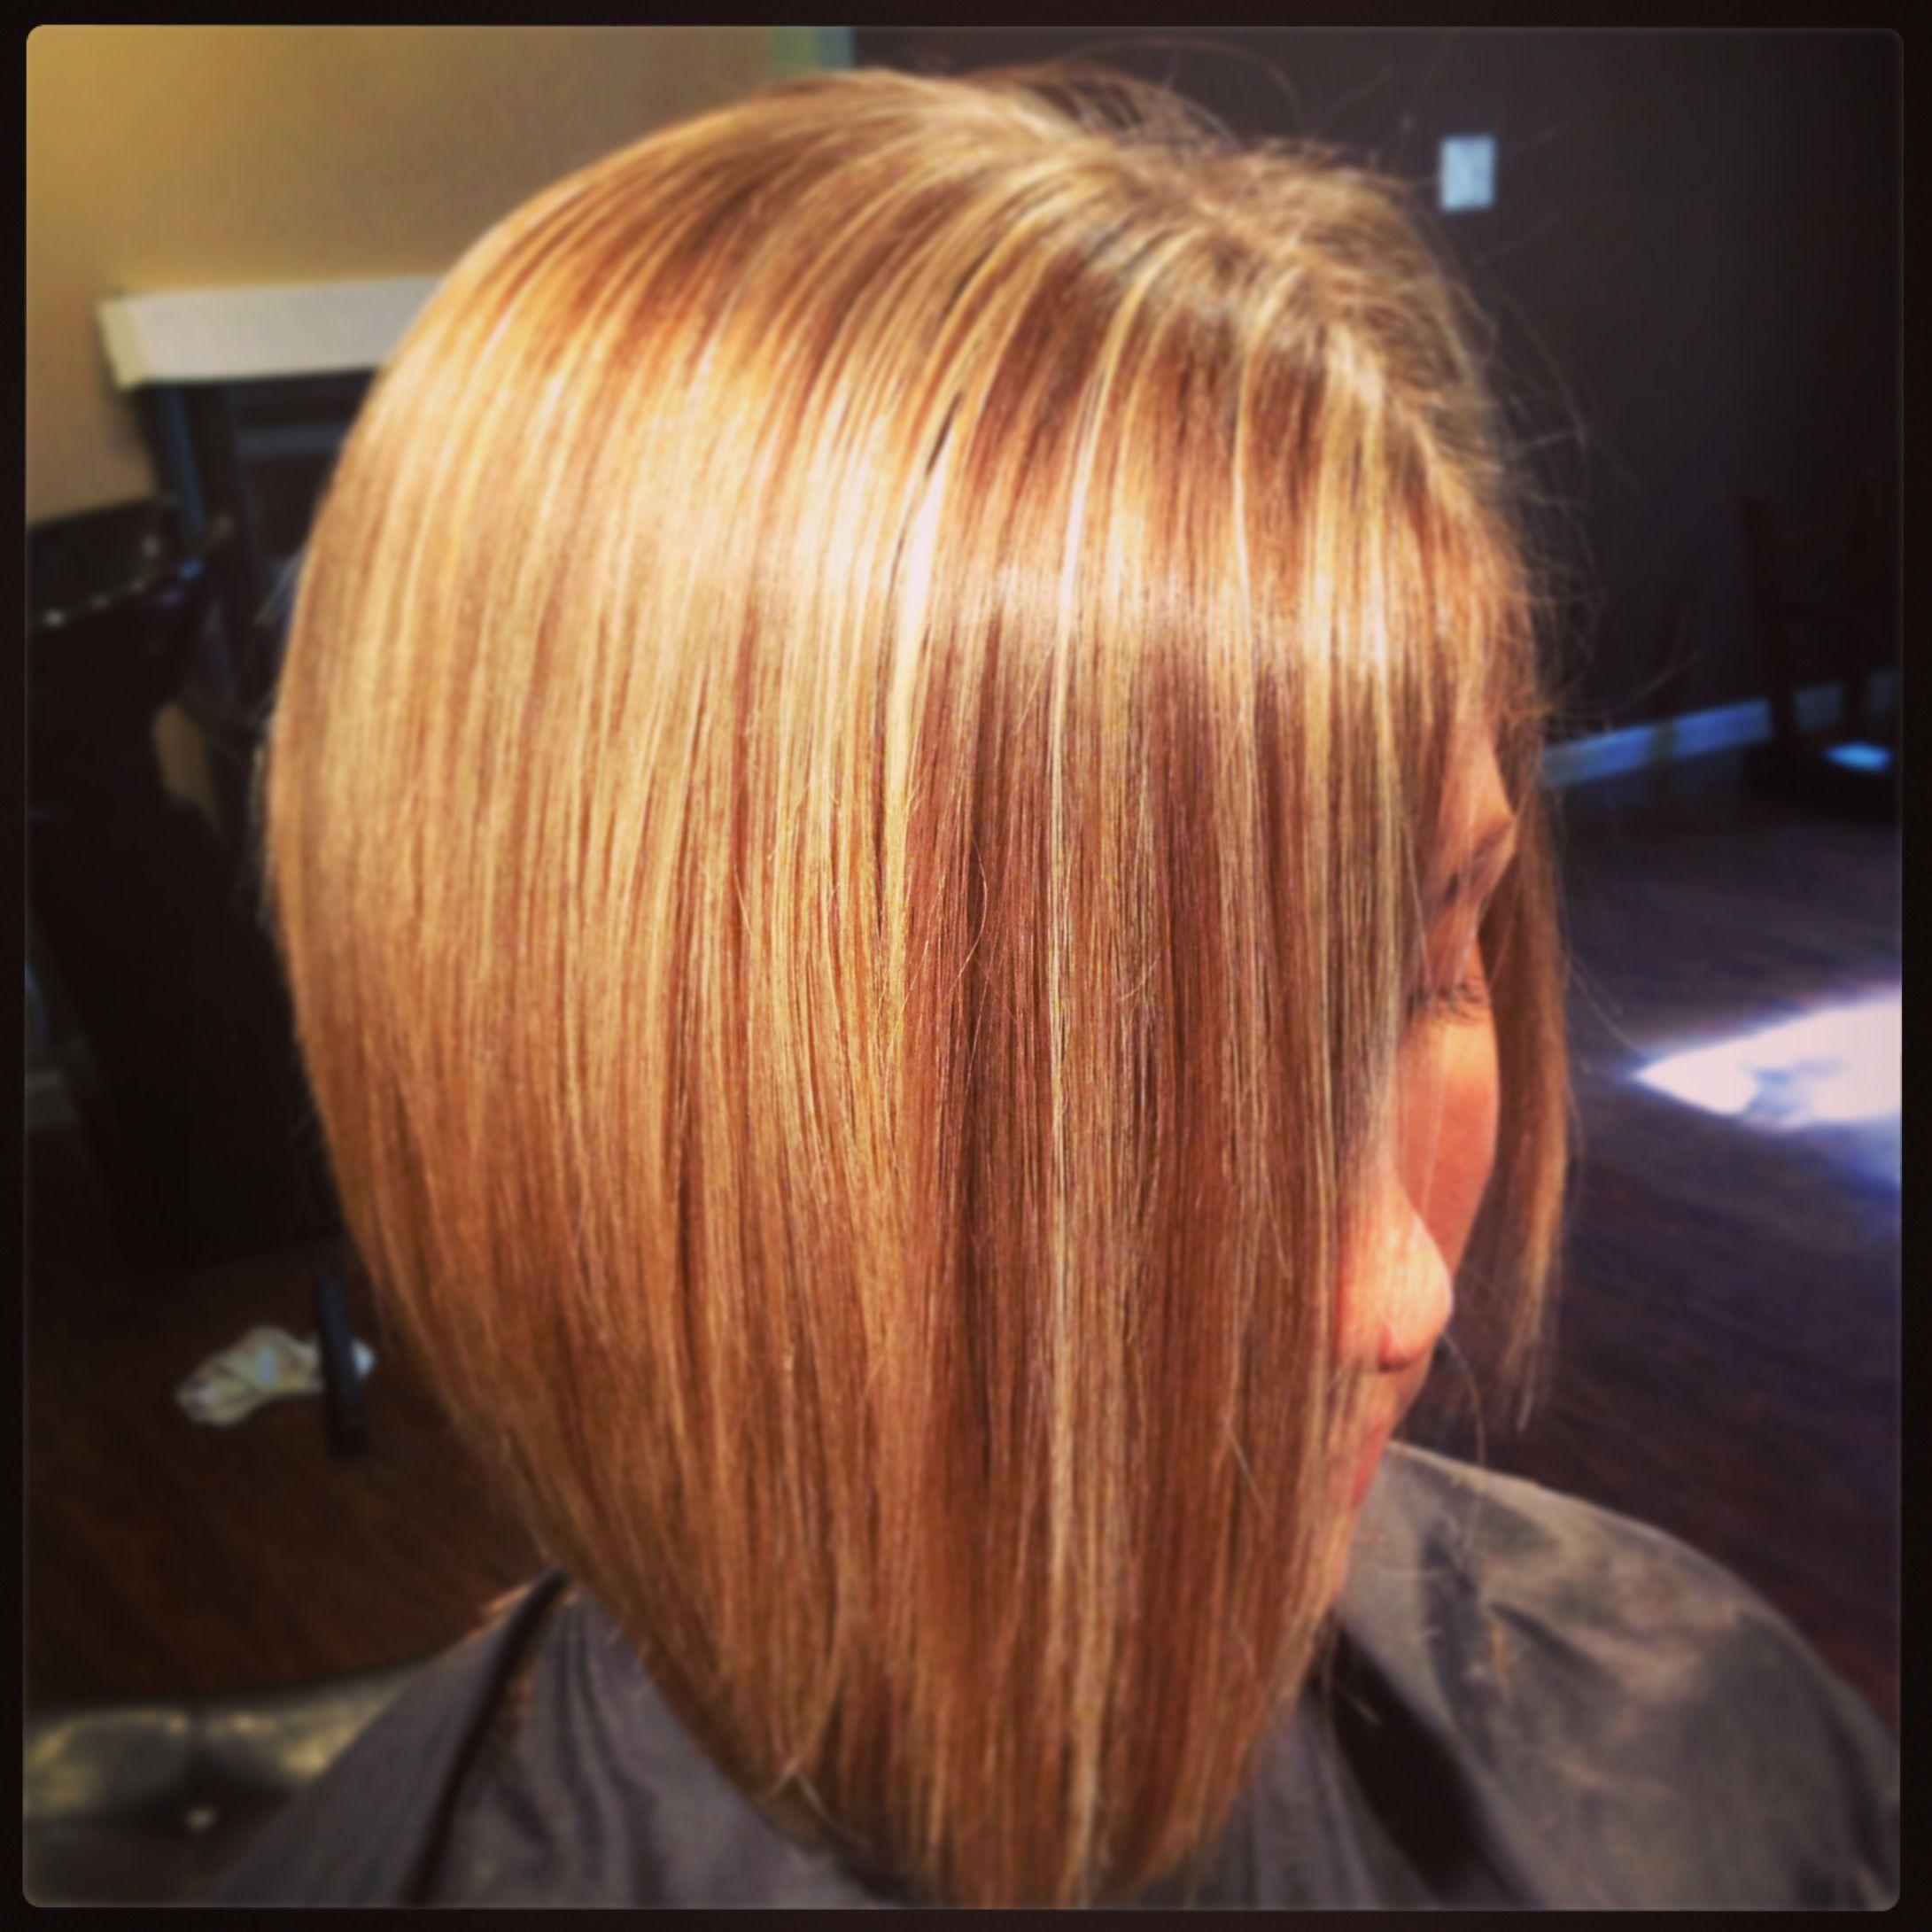 Swing Bob By Kayla Rosales Swing Bob Haircut Haircut